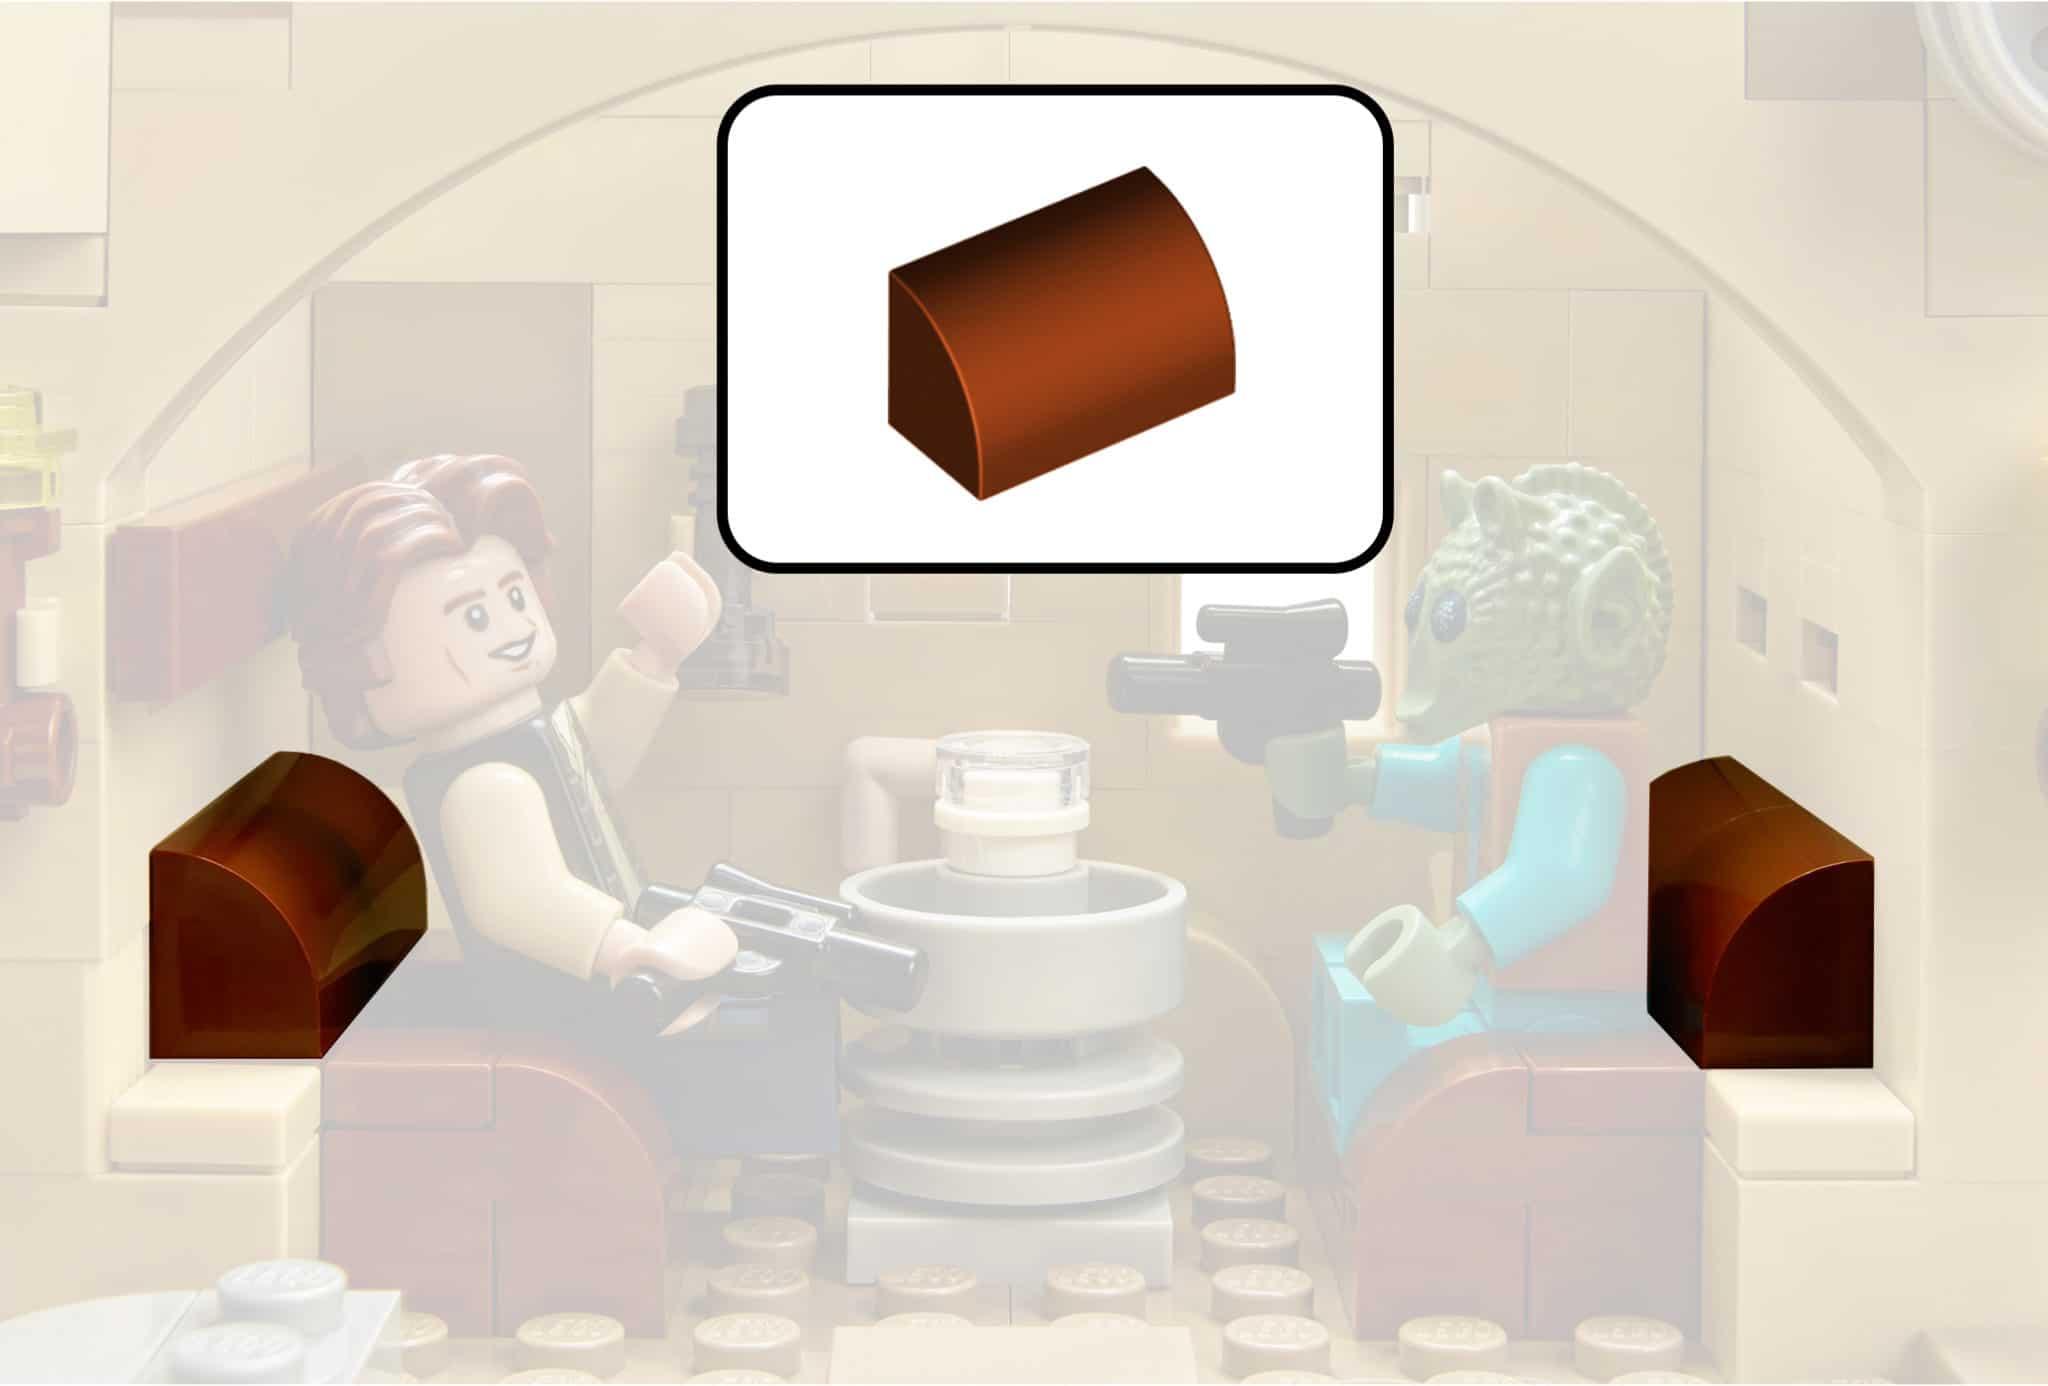 LEGO Star Wars 75052 Mos Eisley Cantina Reddishbrown37352